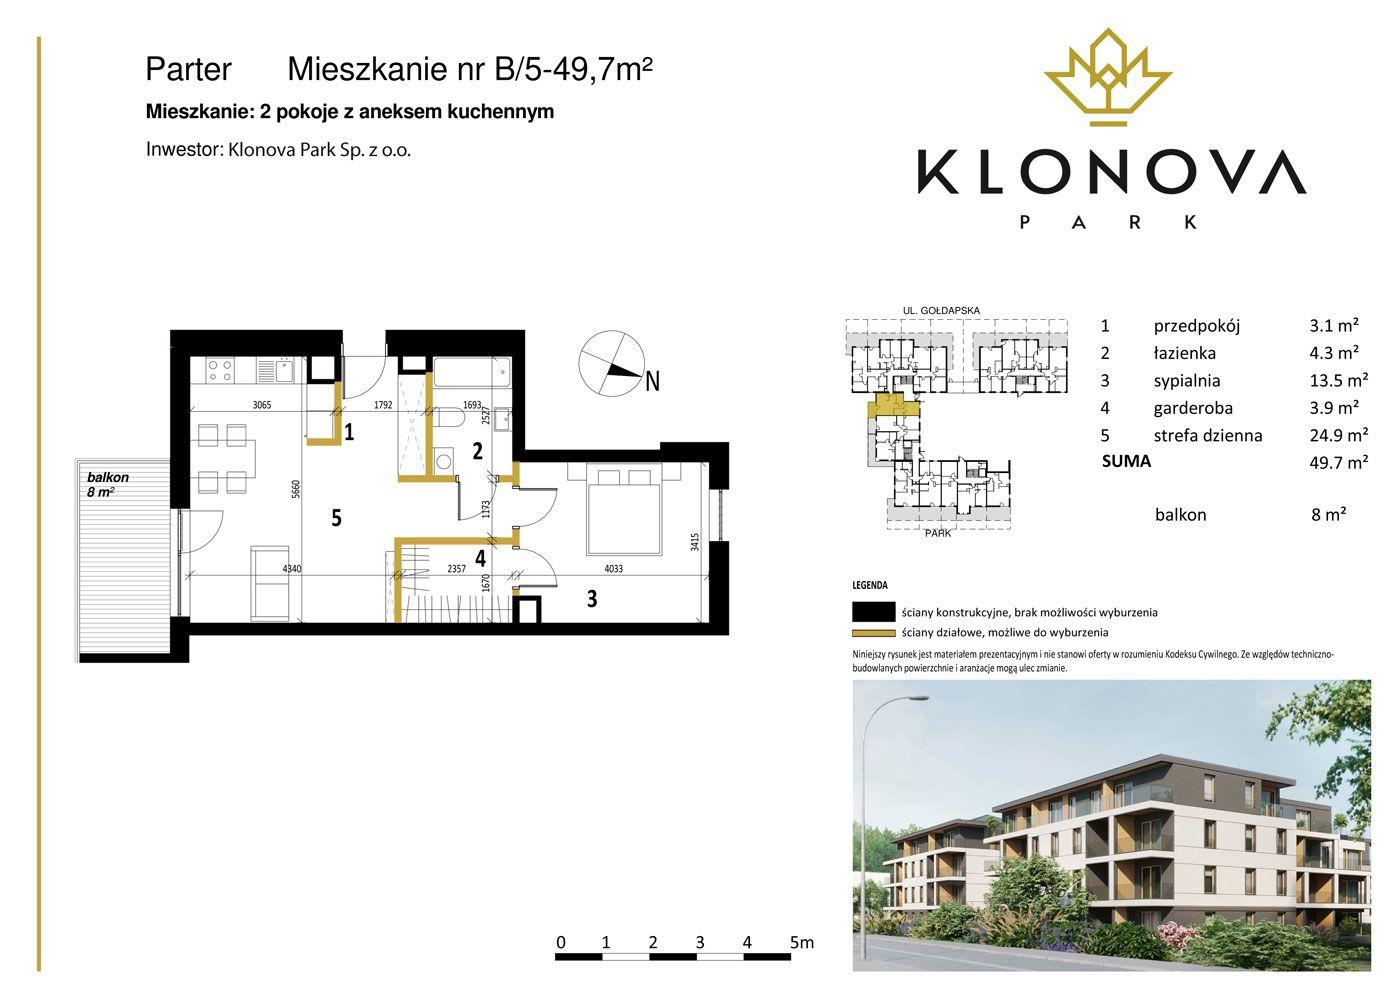 Apartamenty Klonova Park - Plan mieszkania B/5